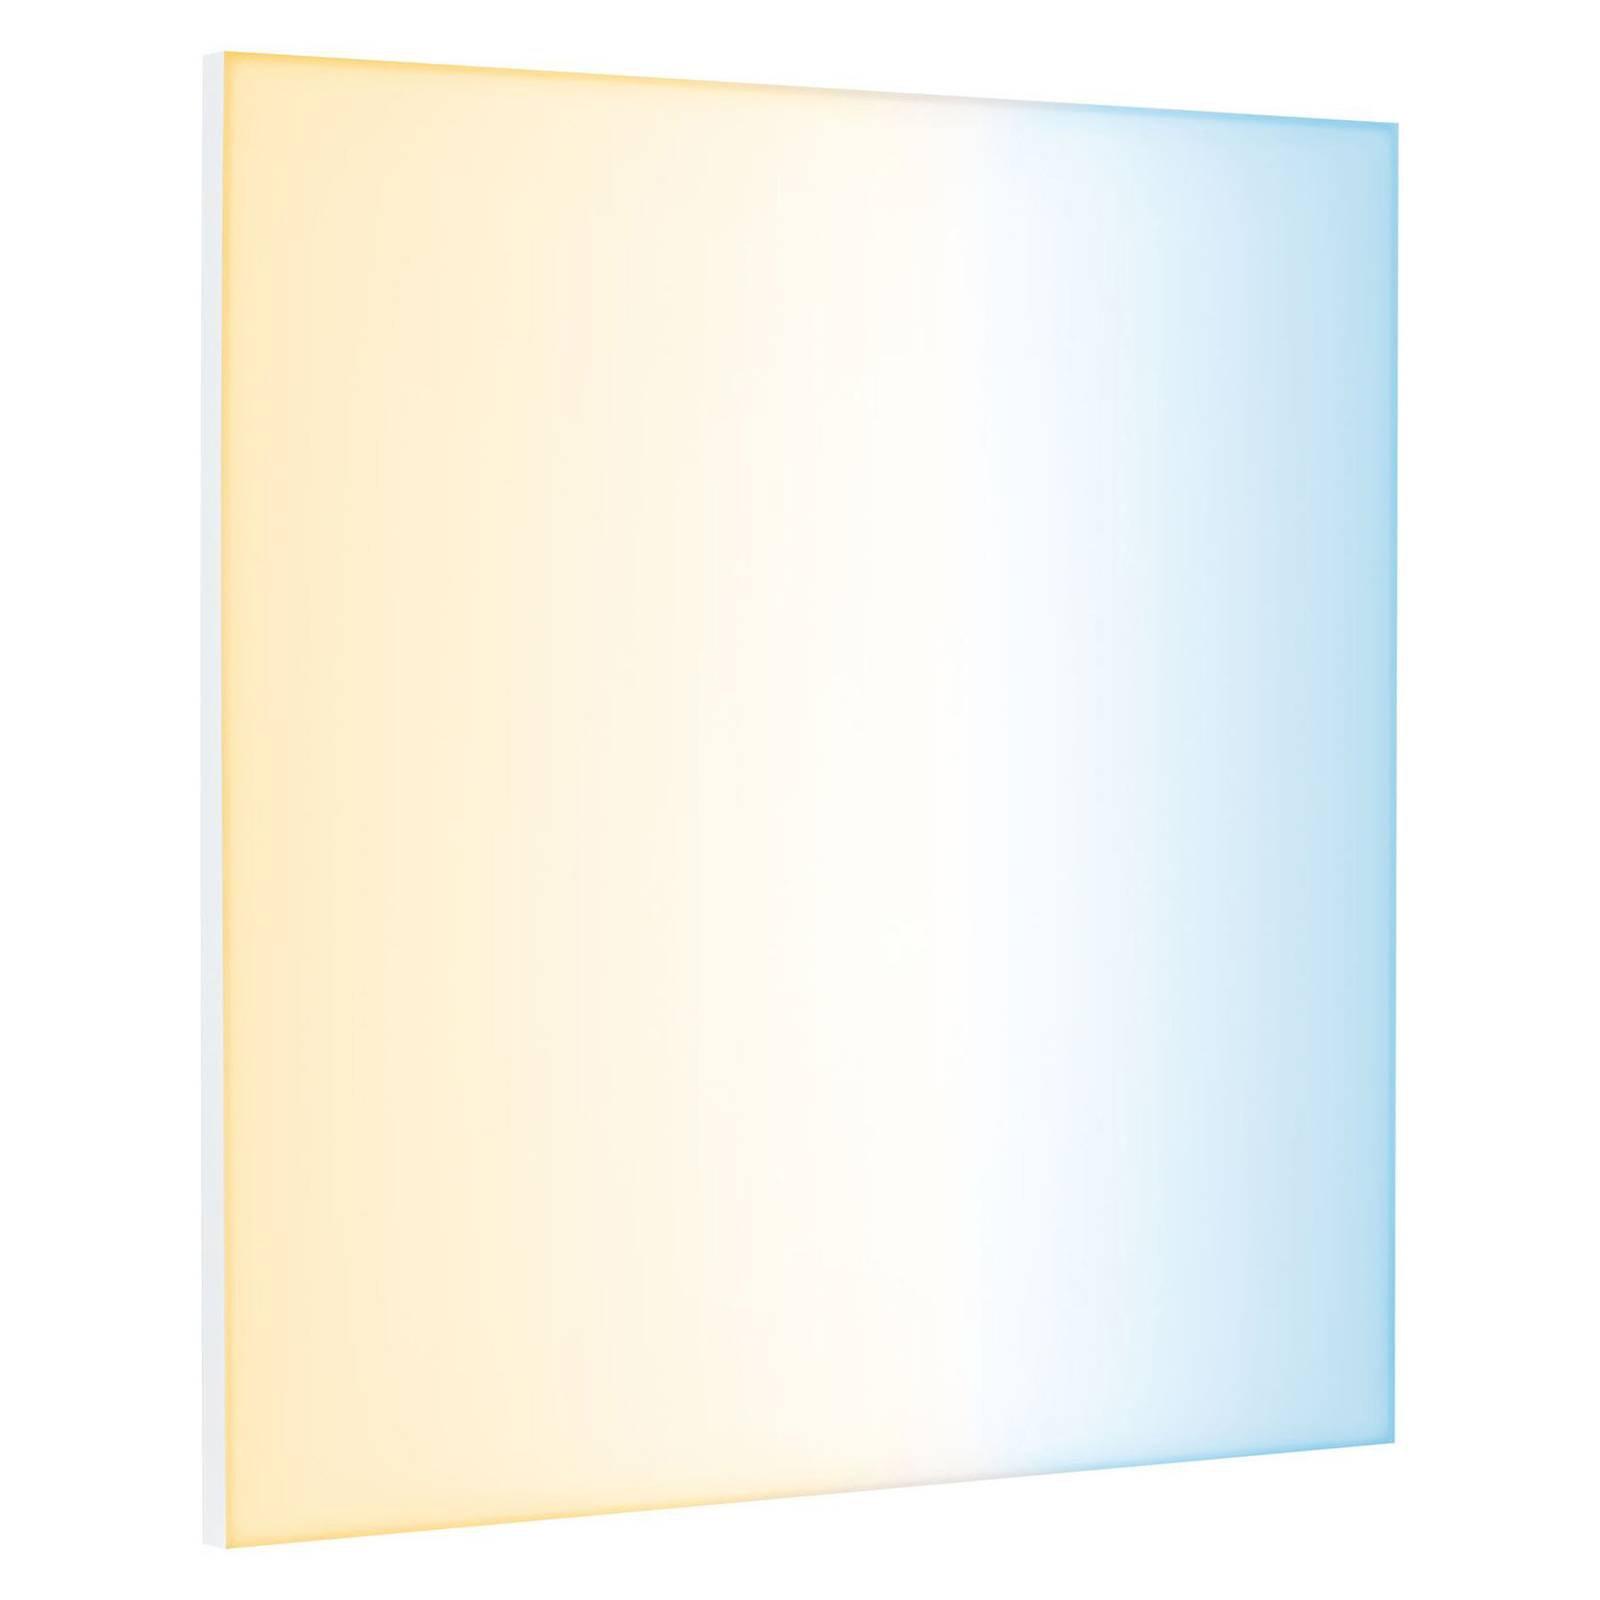 Paulmann Velora LED-panel Zigbee 59,5x59,5cm 19,5W